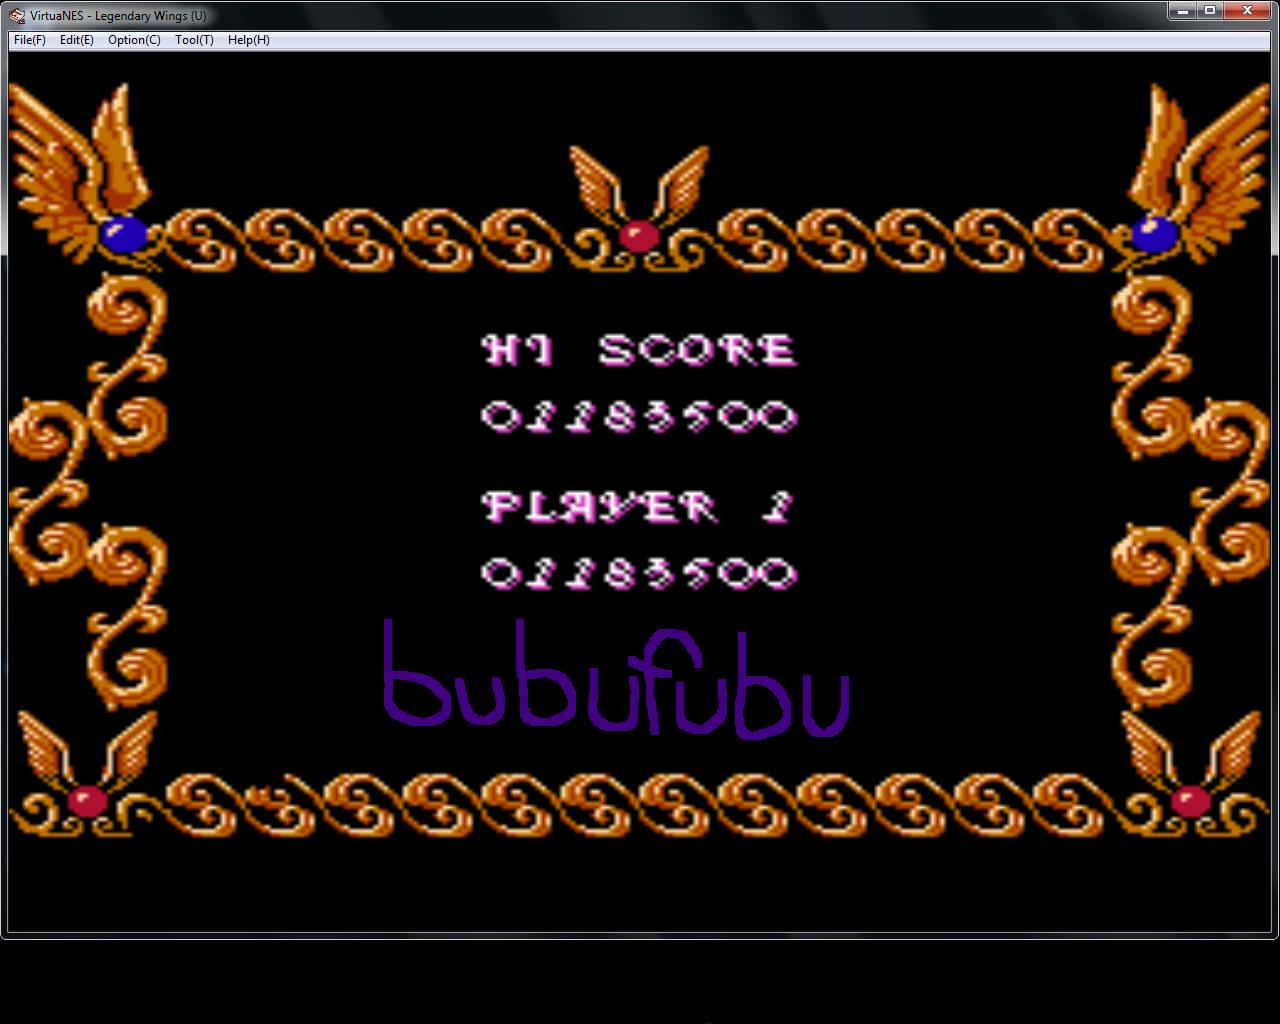 bubufubu: Legendary Wings (NES/Famicom Emulated) 1,183,500 points on 2015-02-28 16:30:03